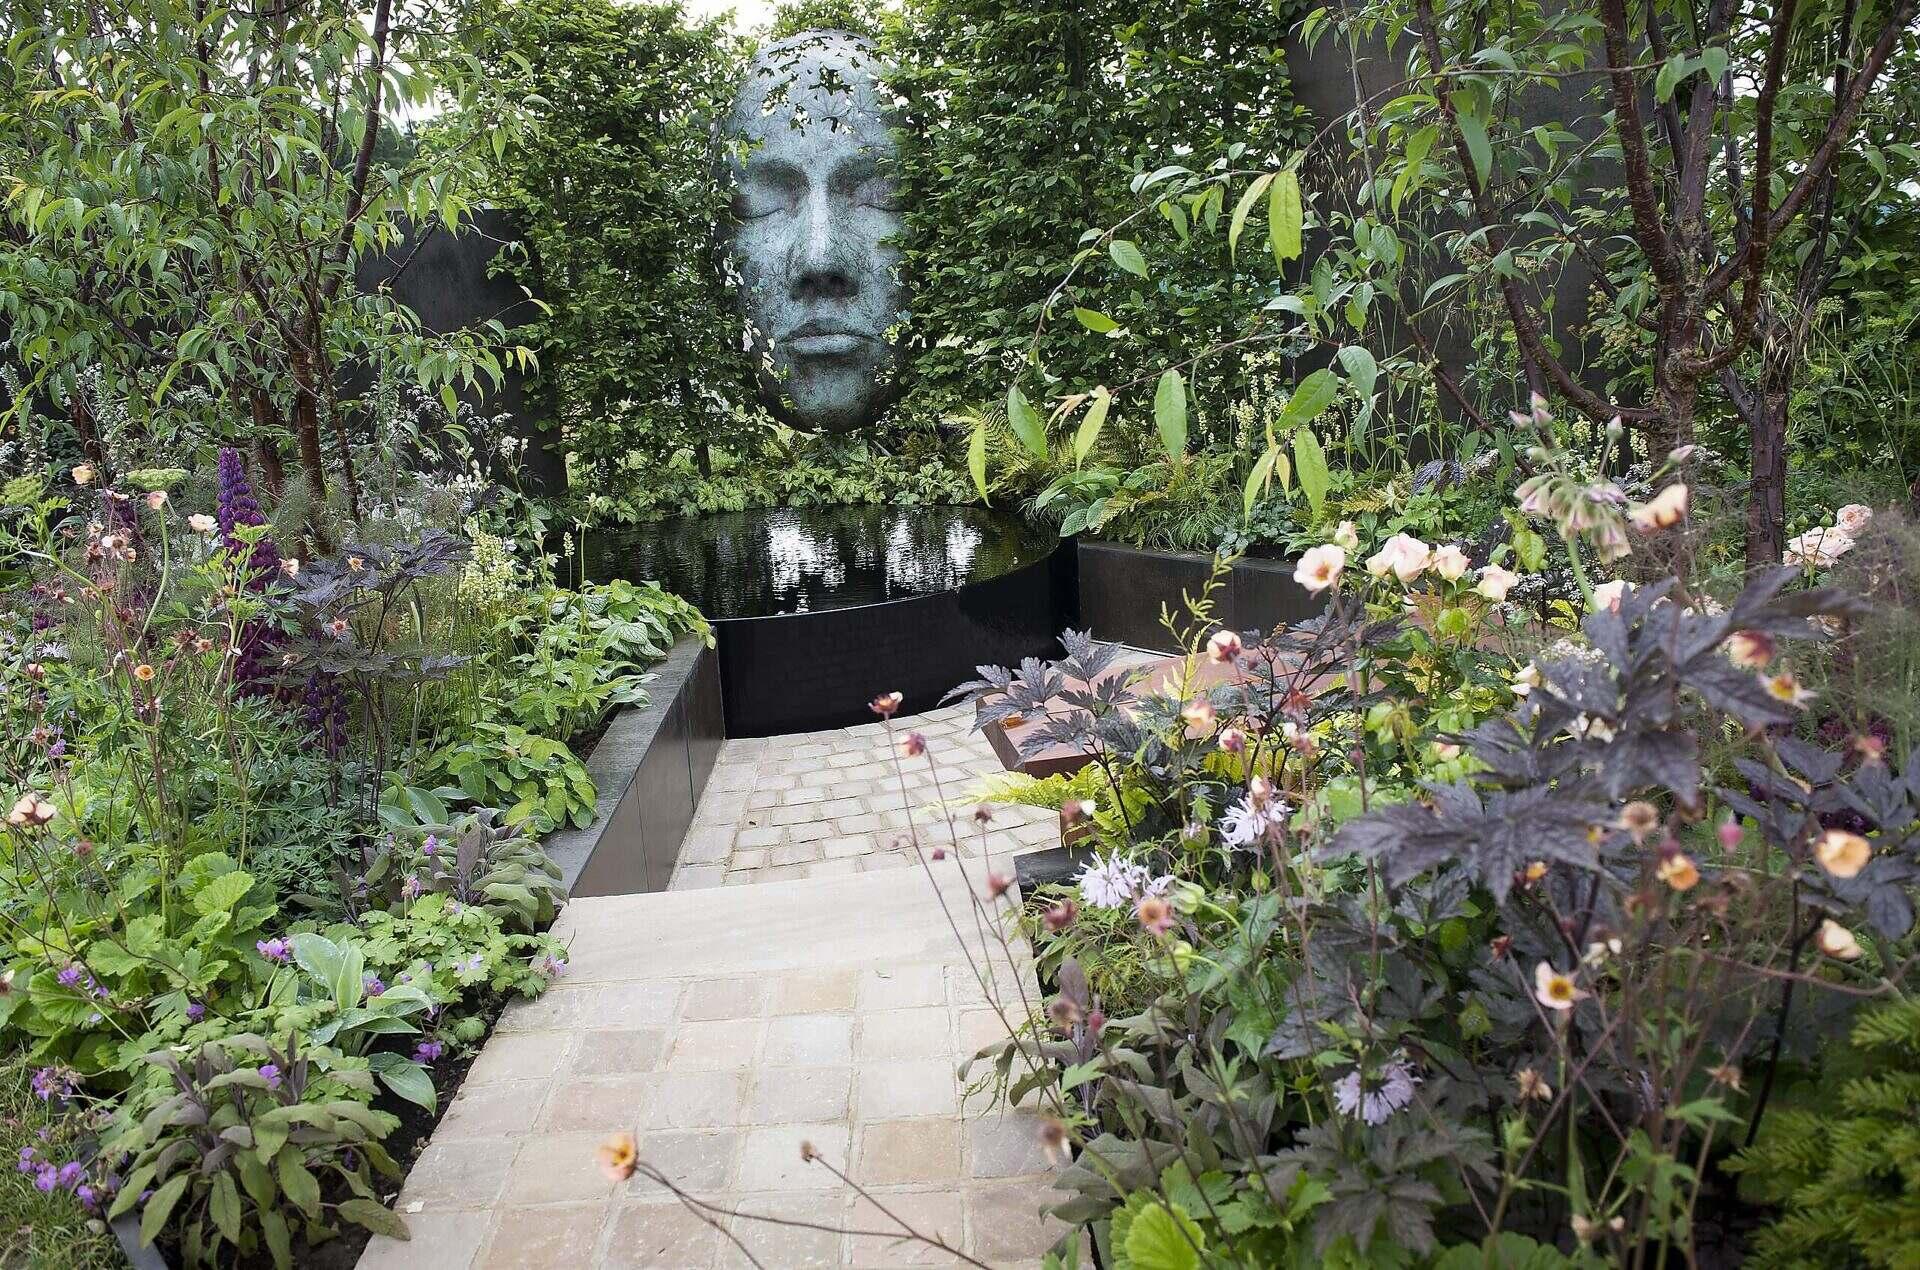 Show garden at RHS Chatsworth showing sculpture